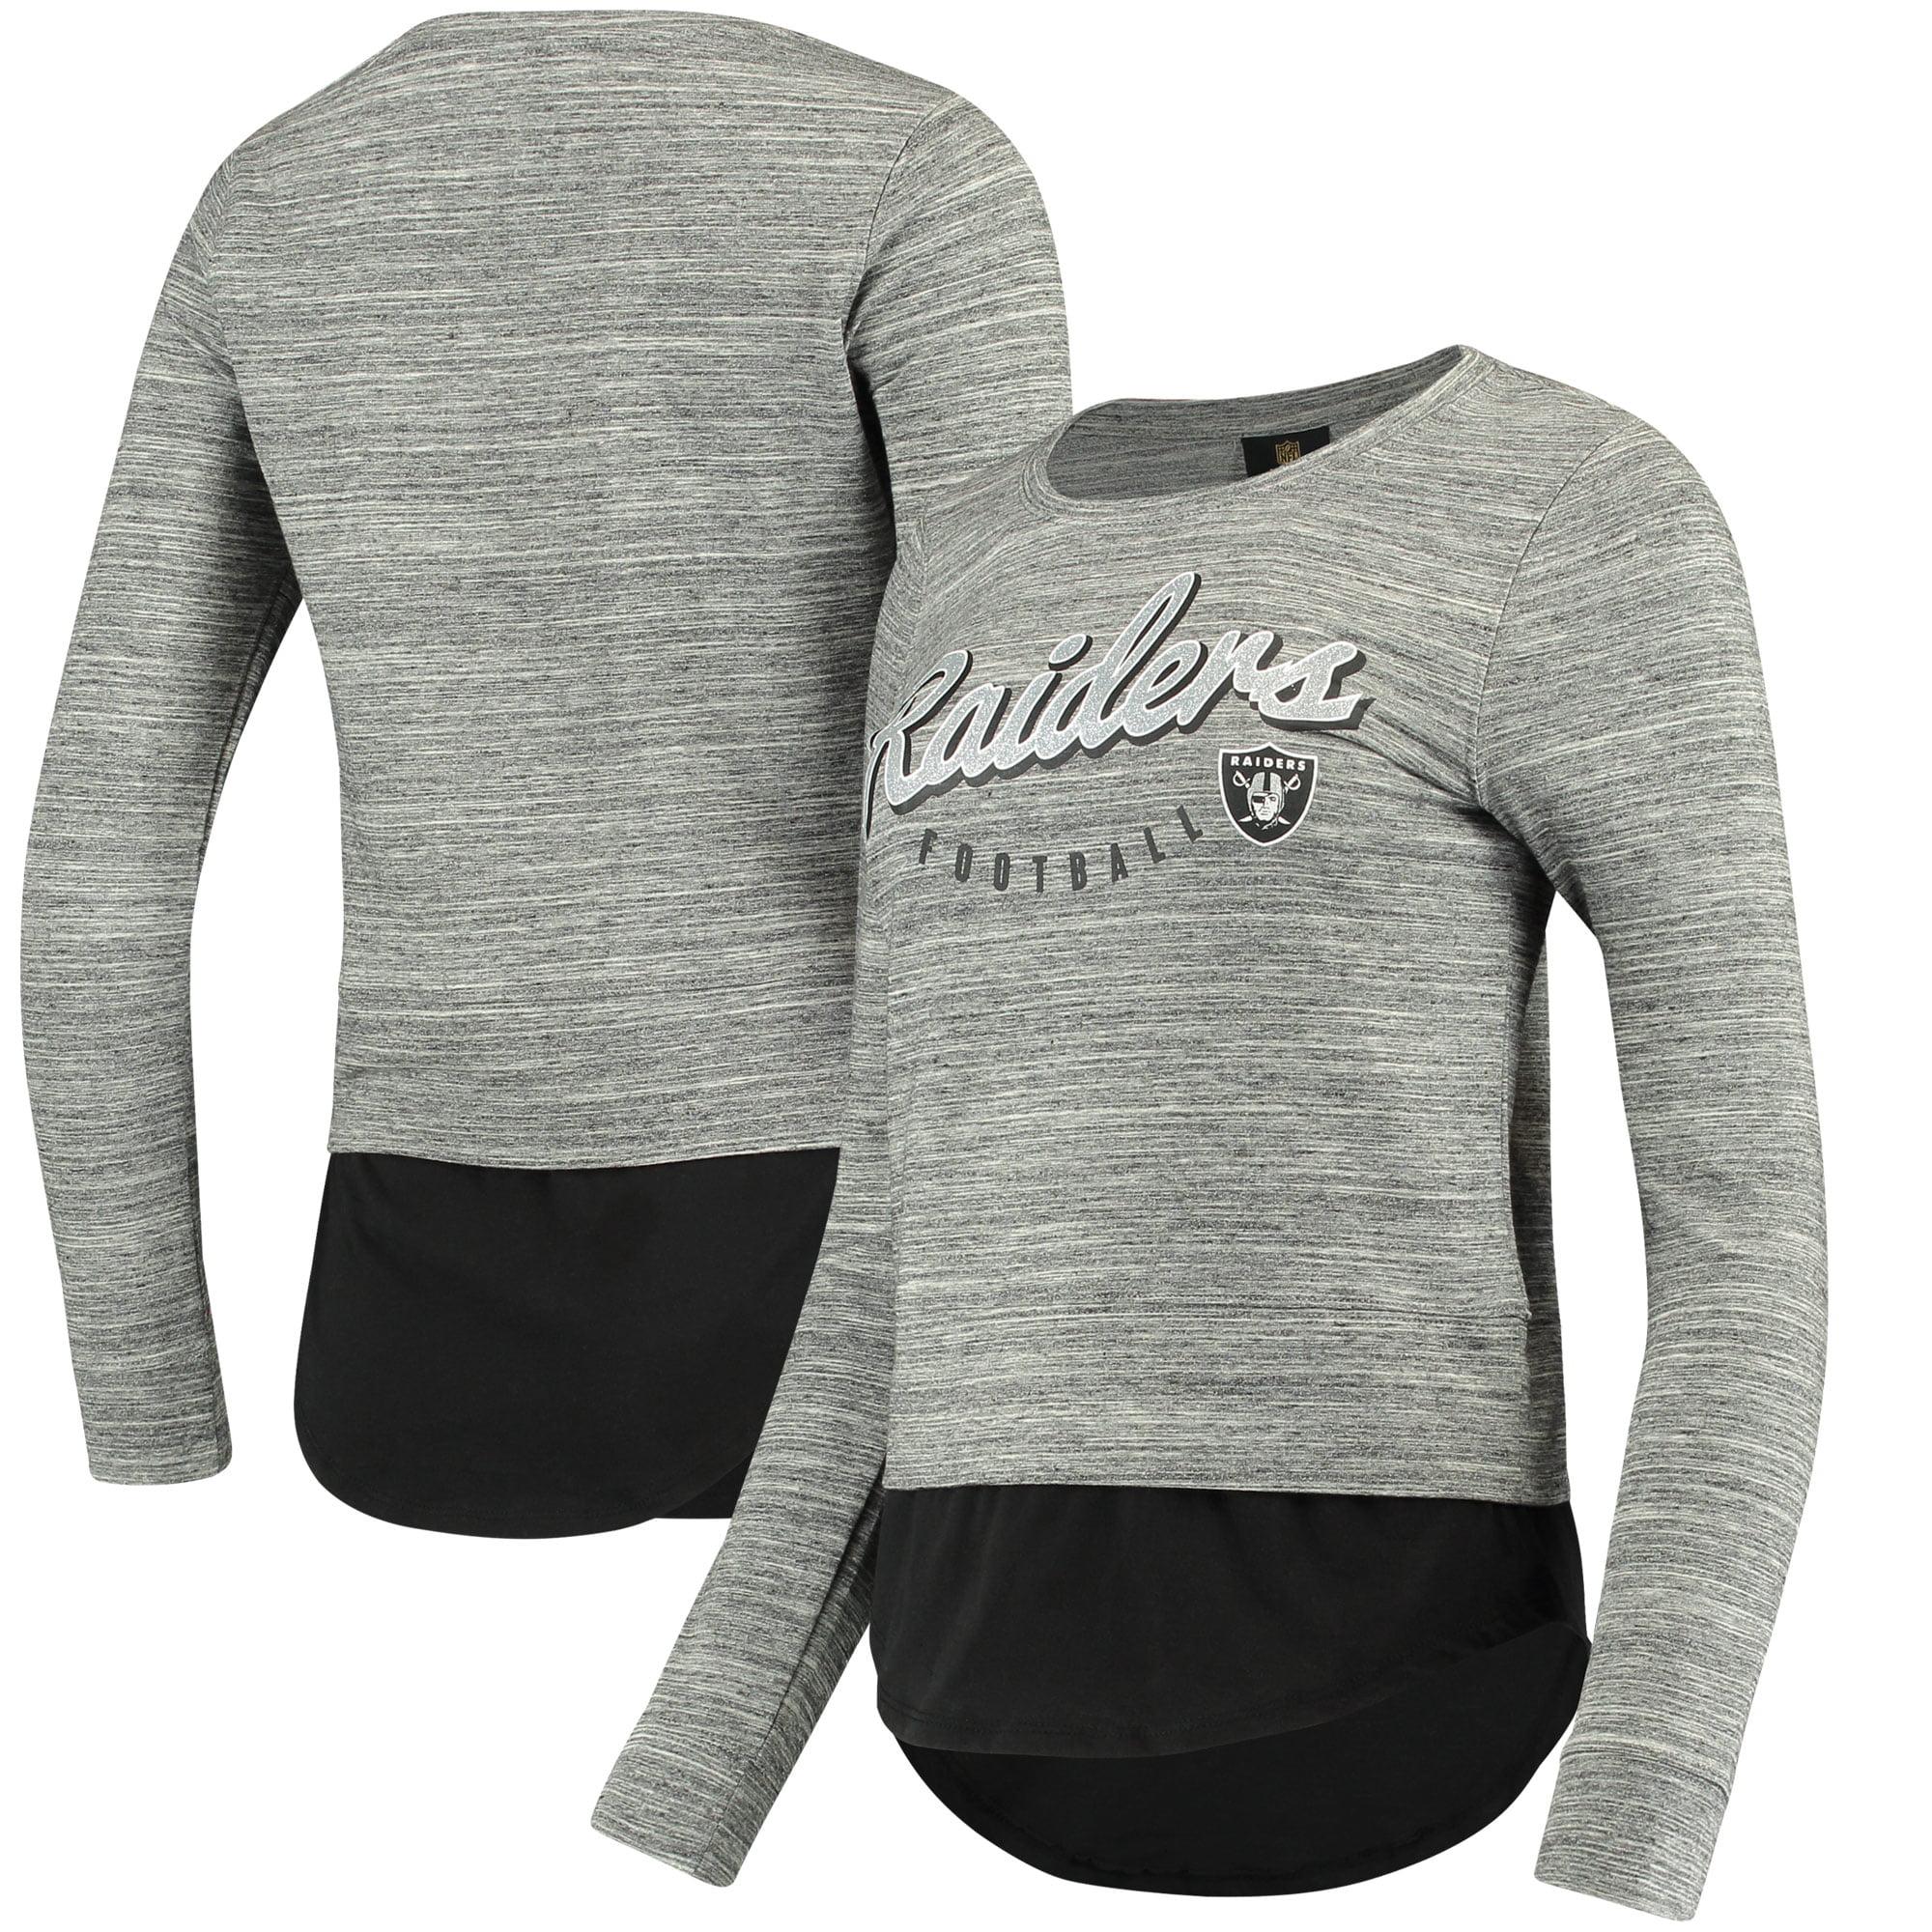 Oakland Raiders Women's Juniors Shirt Tail Layered Long Sleeve T-Shirt - Heathered Gray/Black